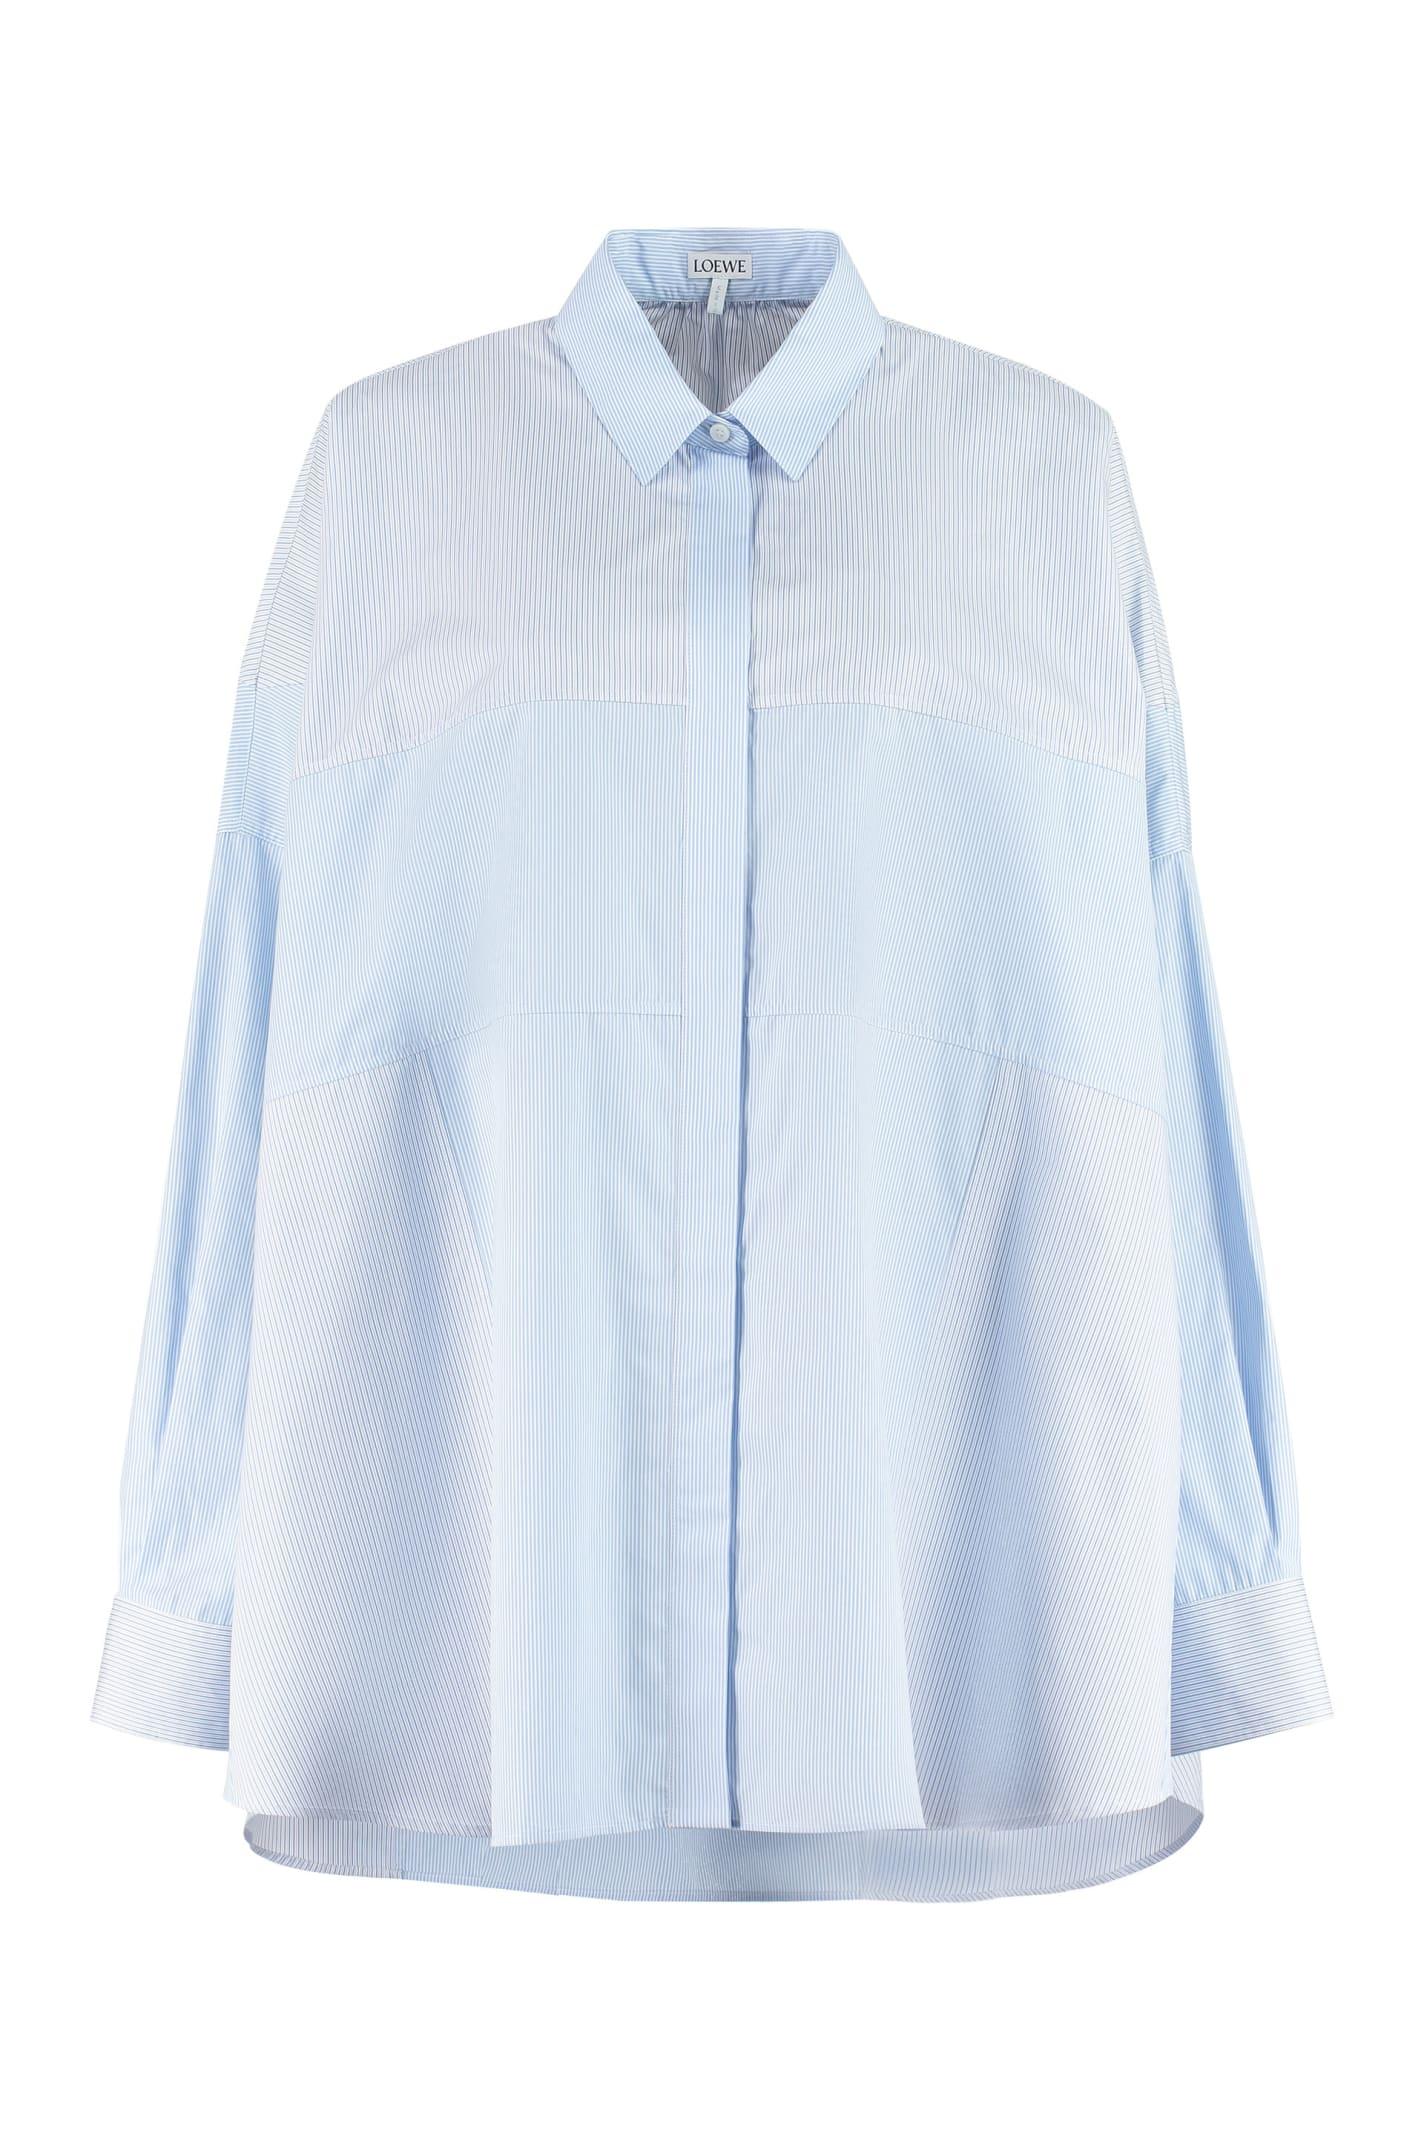 Loewe Striped Stretch Cotton Shirt